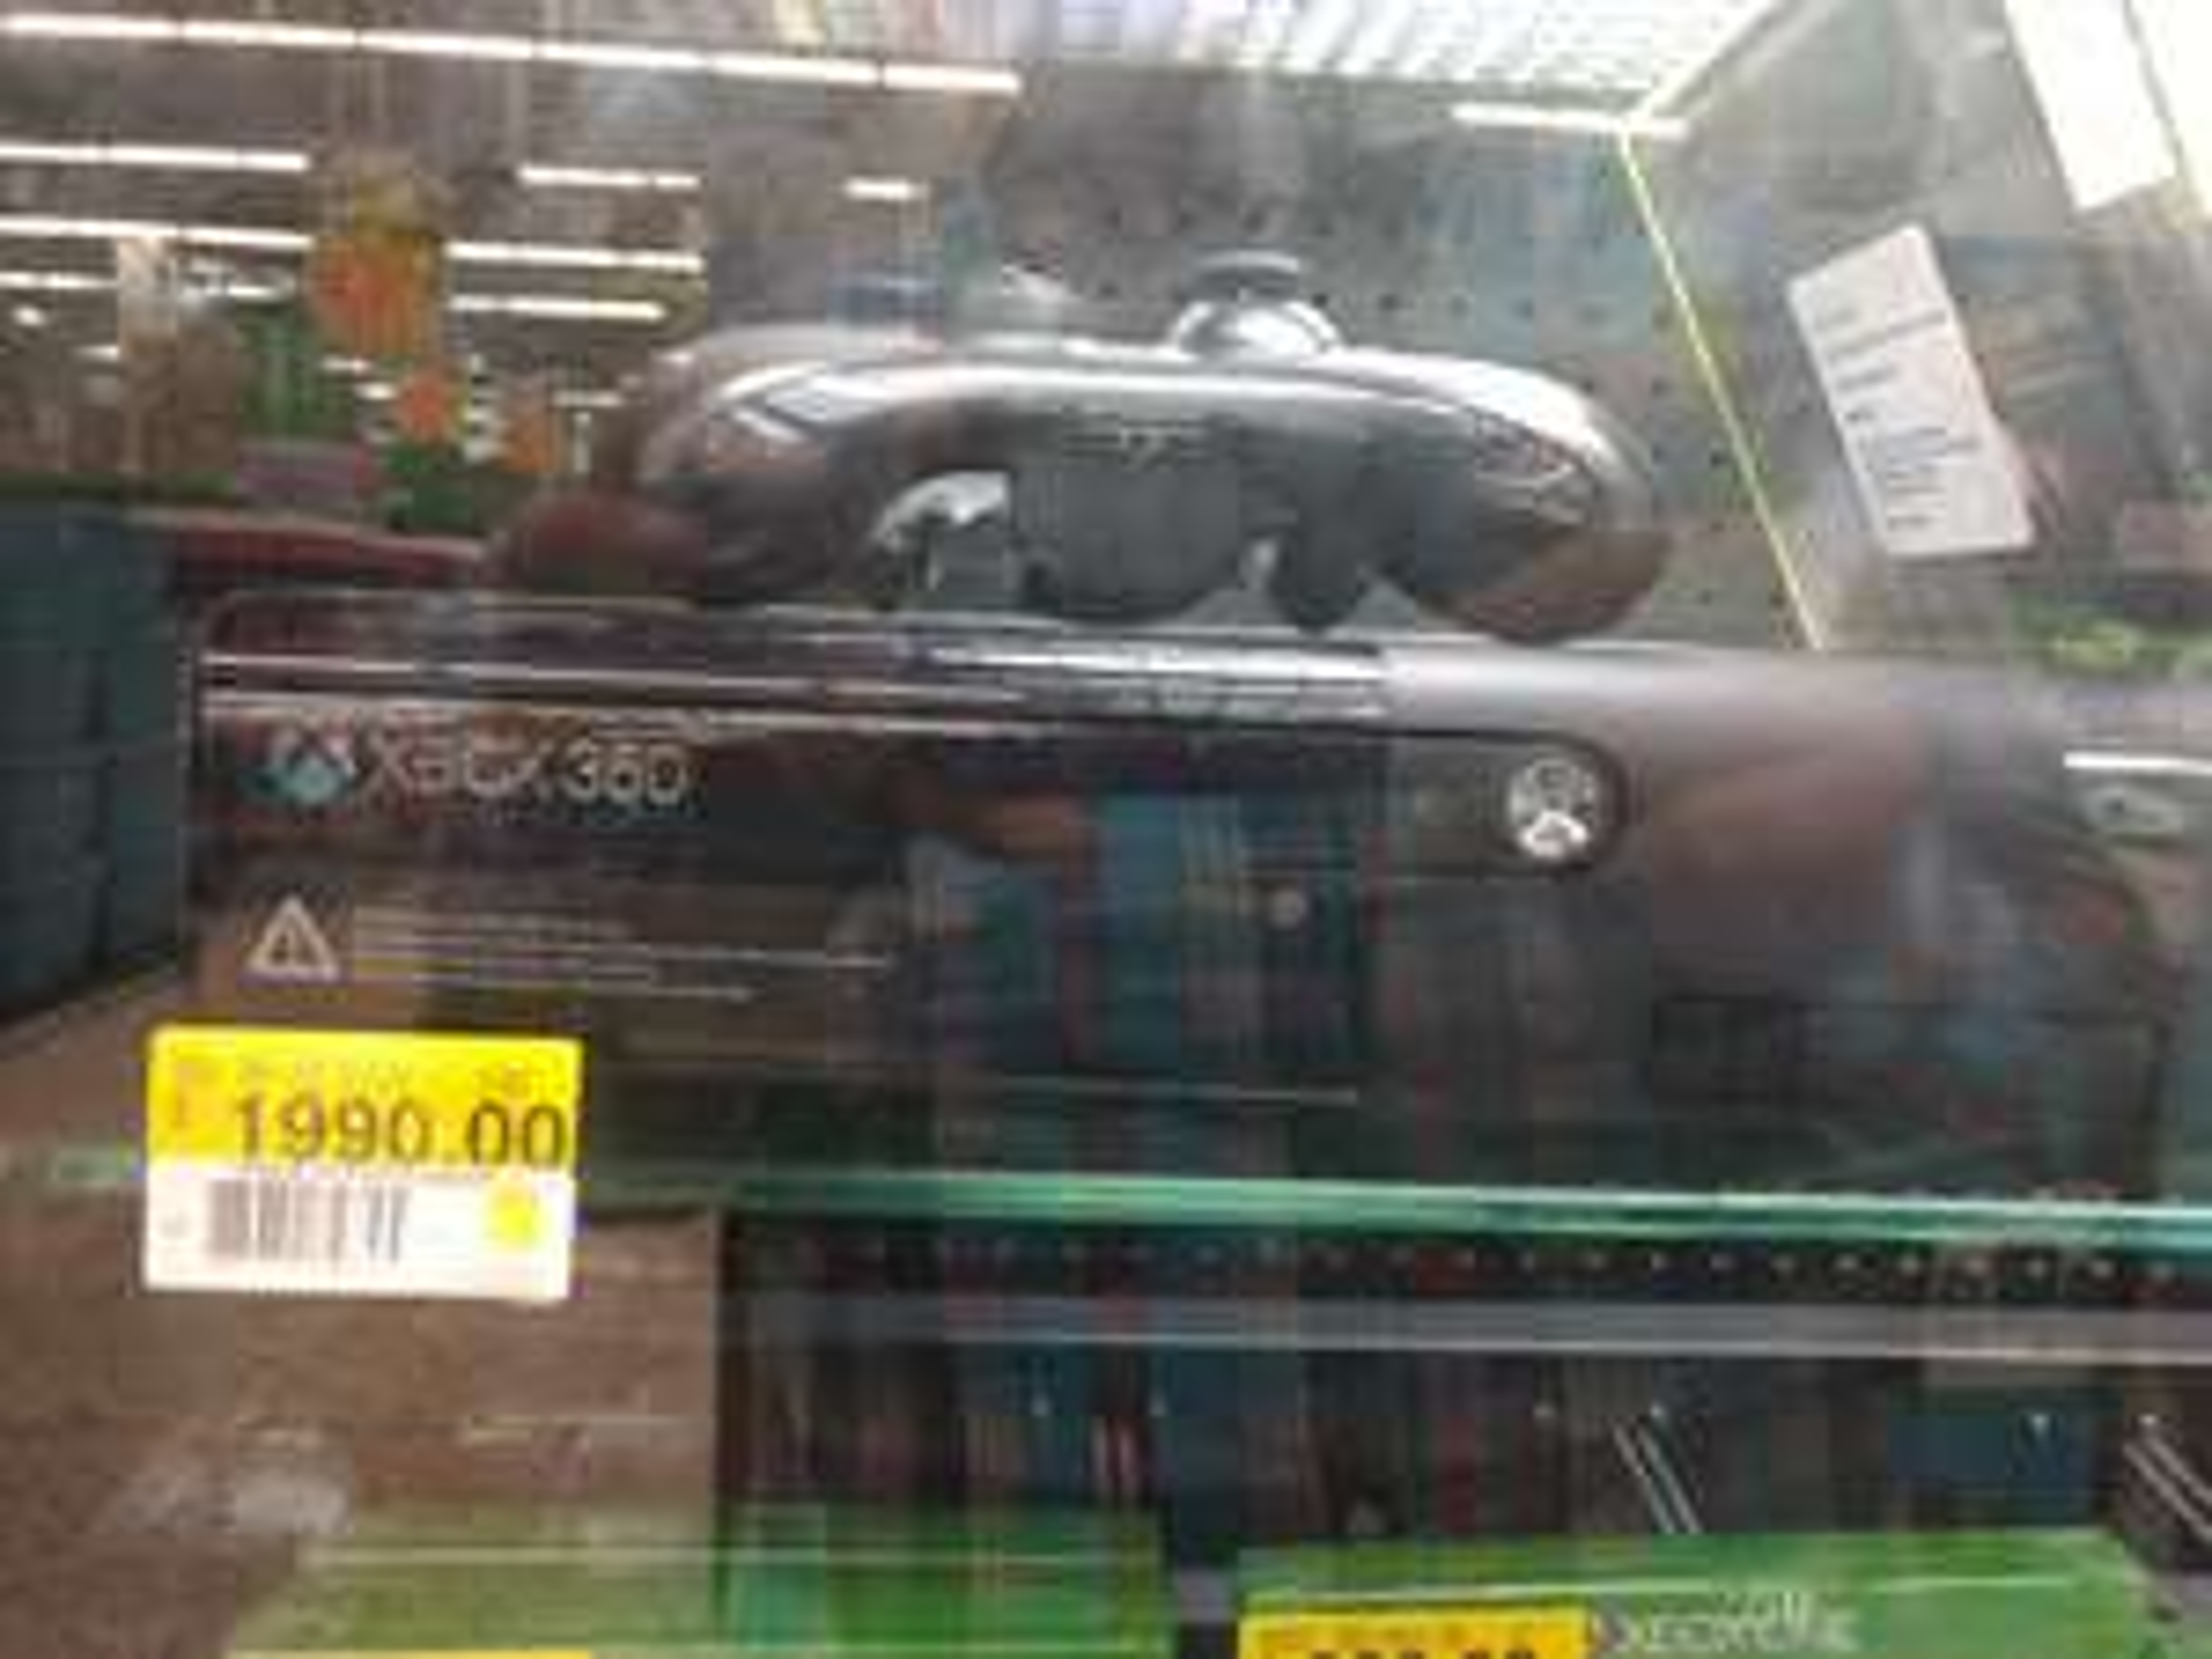 Bodega Aurrerá: Xbox 360 E 4GB Reconstruido a $1,990